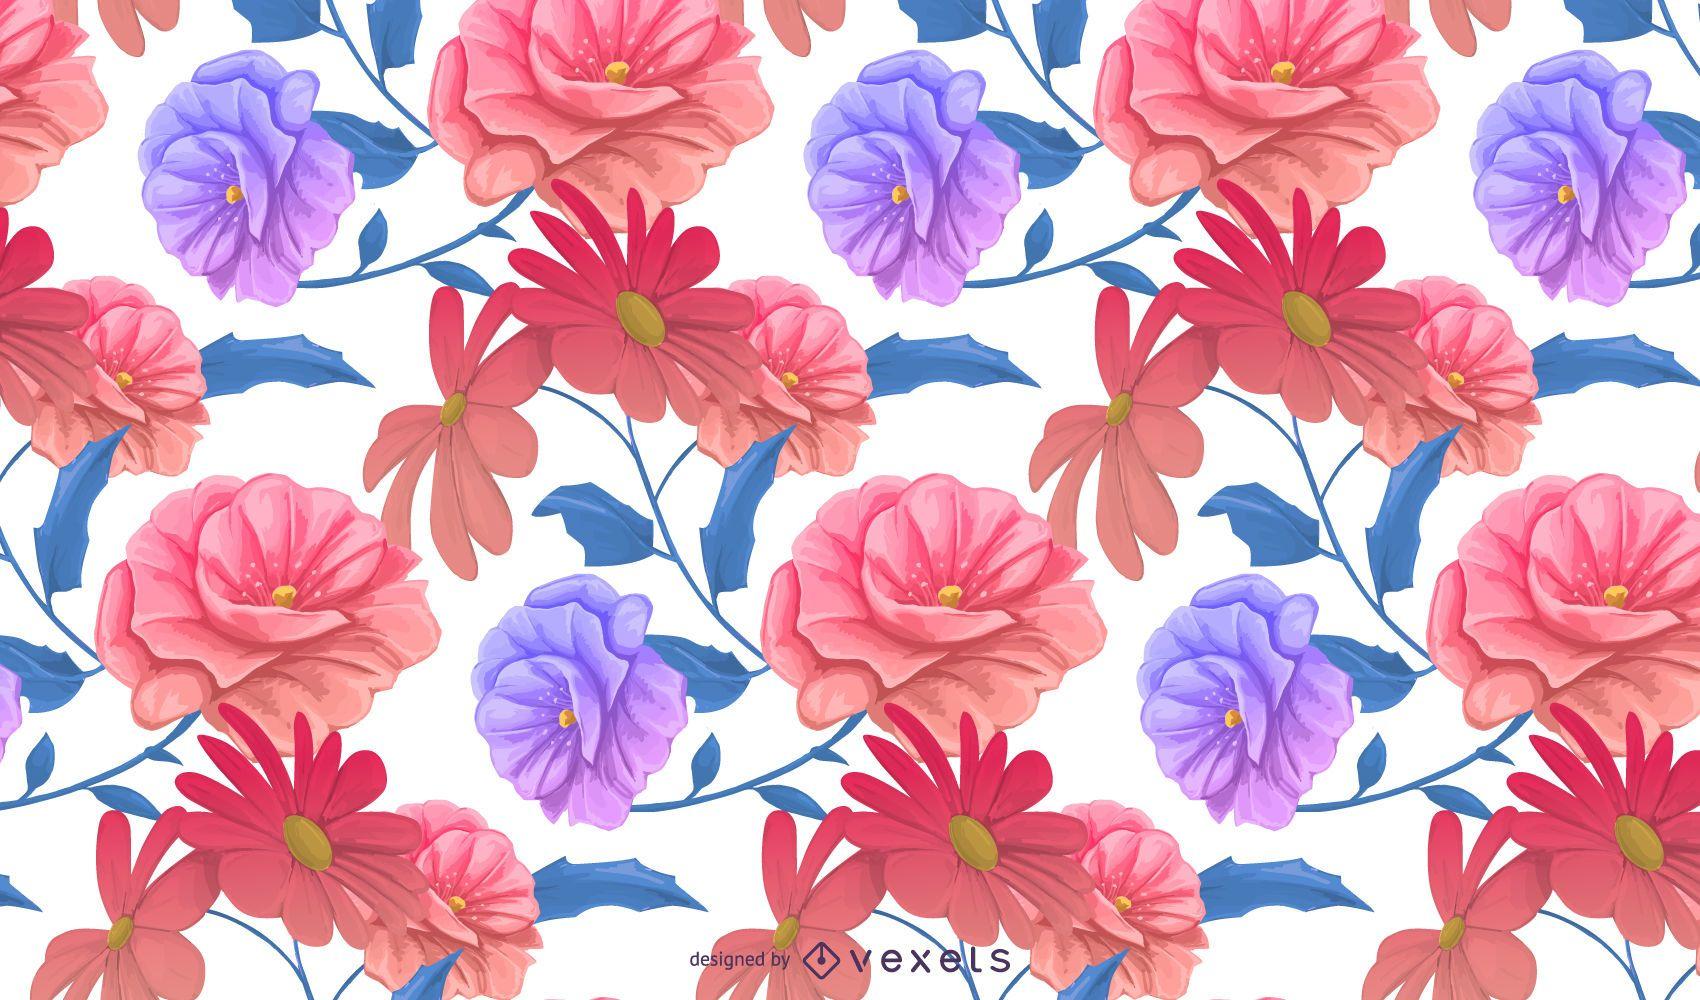 Floral Colorful Pattern Design